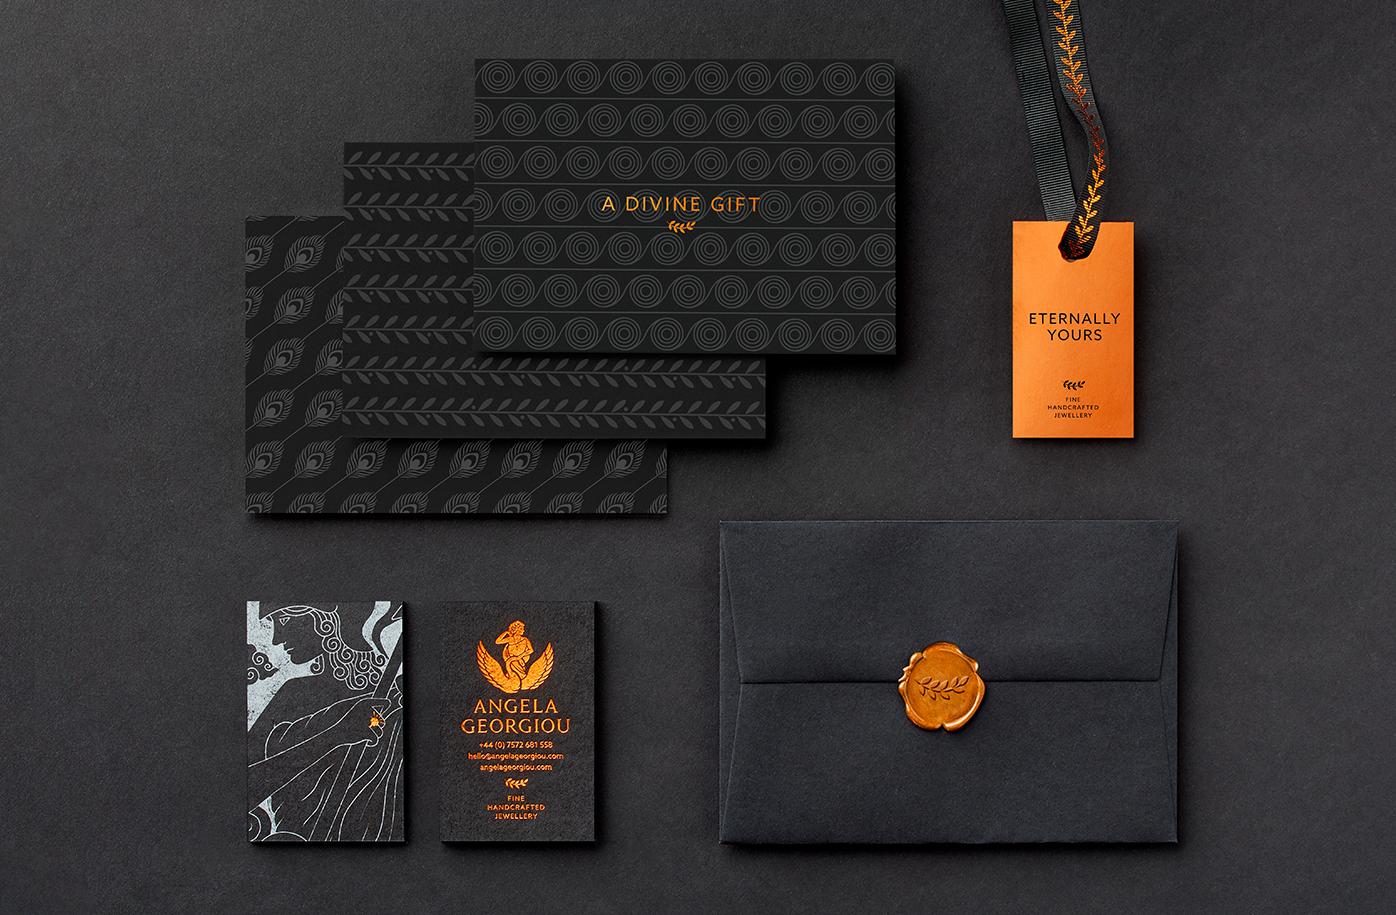 Angela-Georgiou-Stationery-jewellery